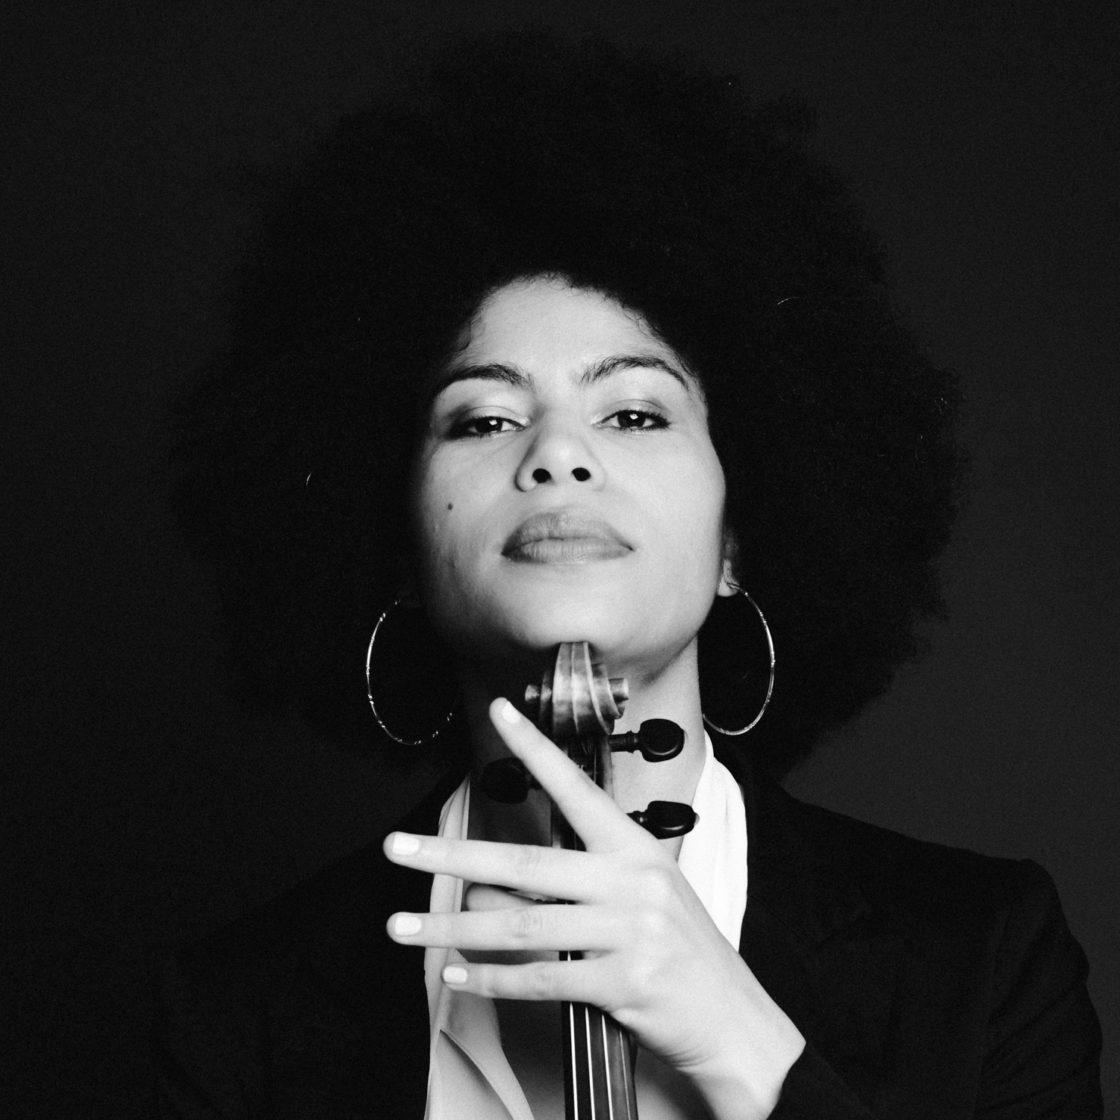 portrait artiste en studio - violoniste